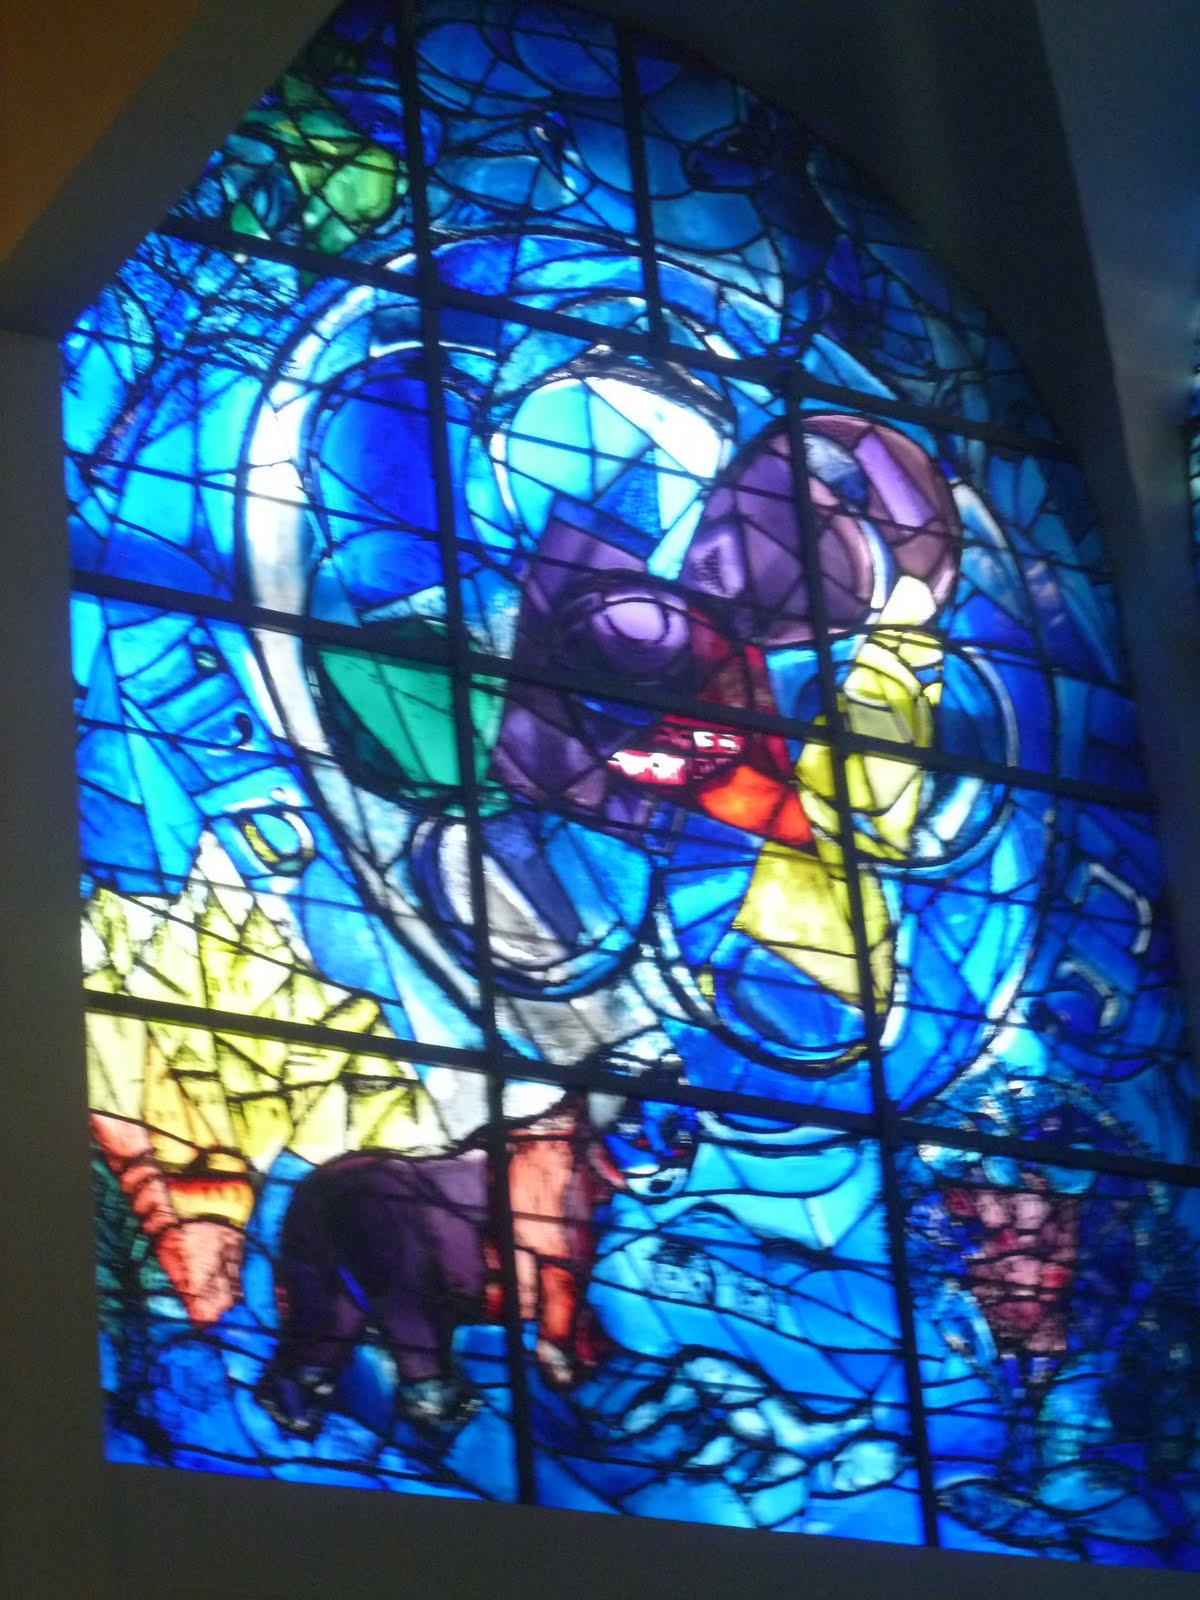 Chagall Windows Hadassah Chagall Hadassah Windows